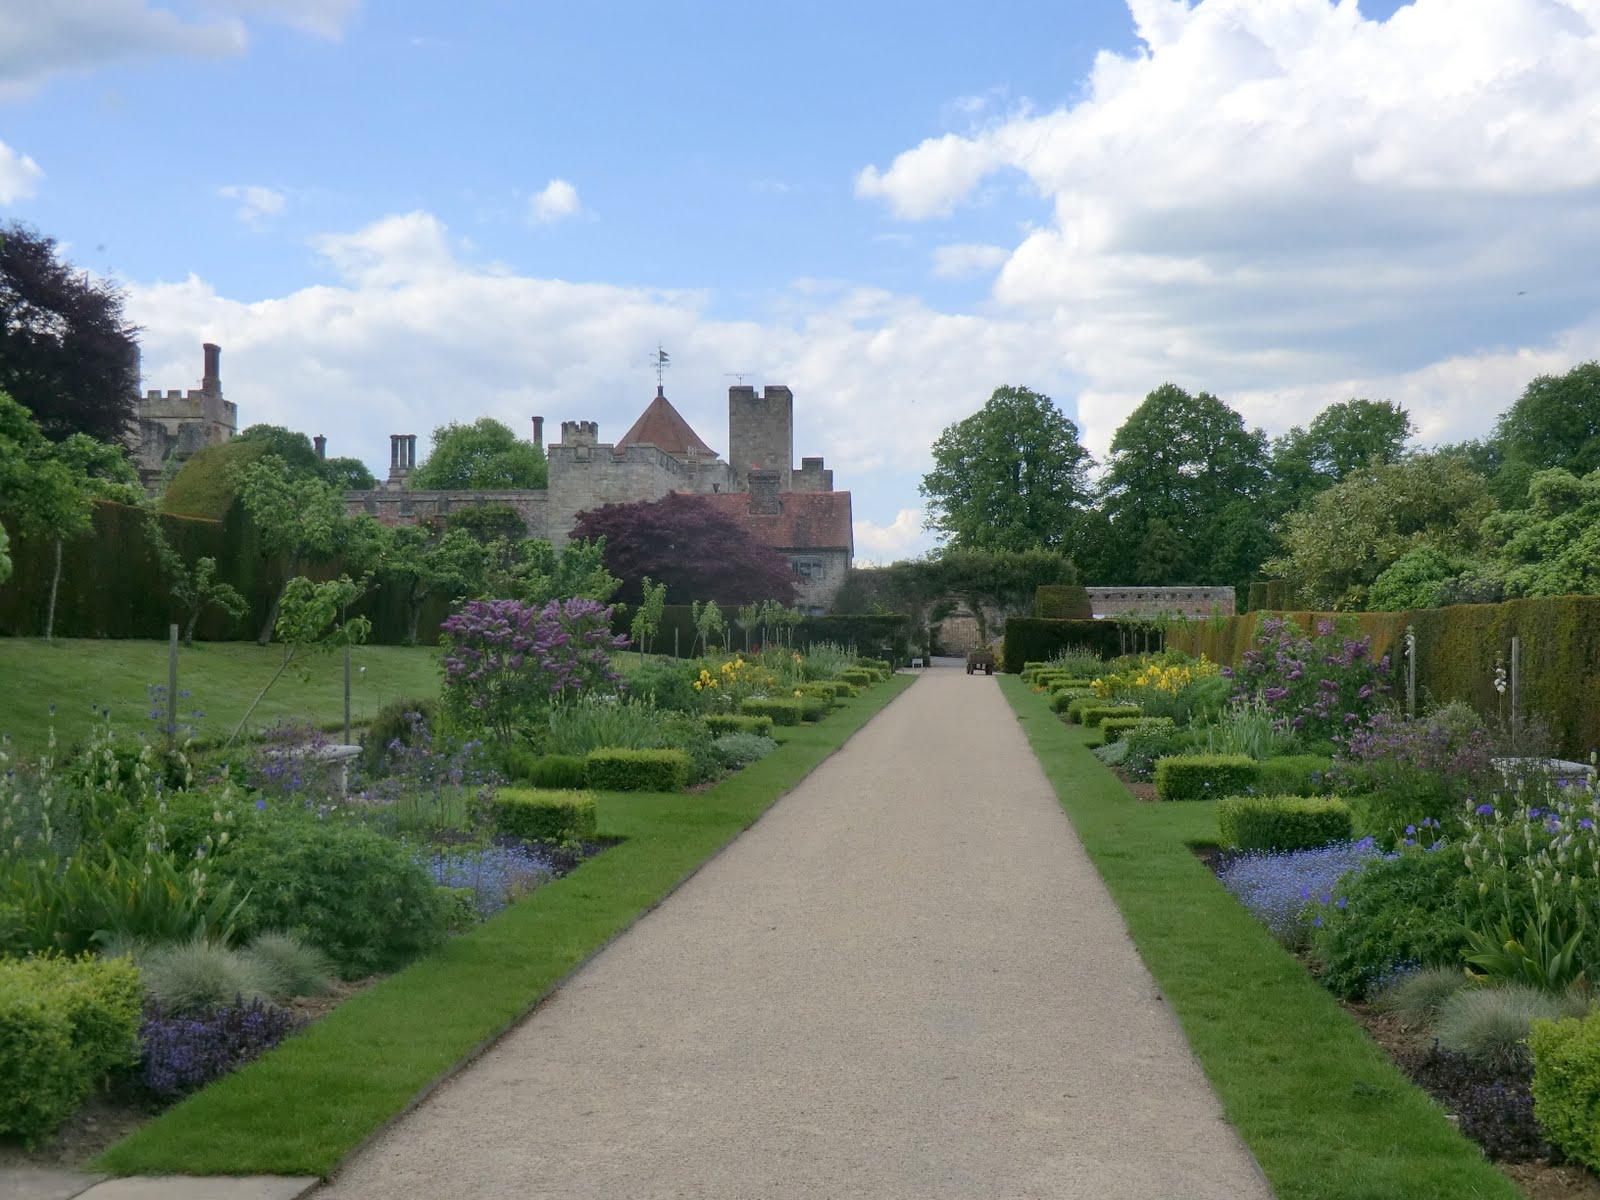 CIMG1114 A glimpse of Penshurst Place gardens